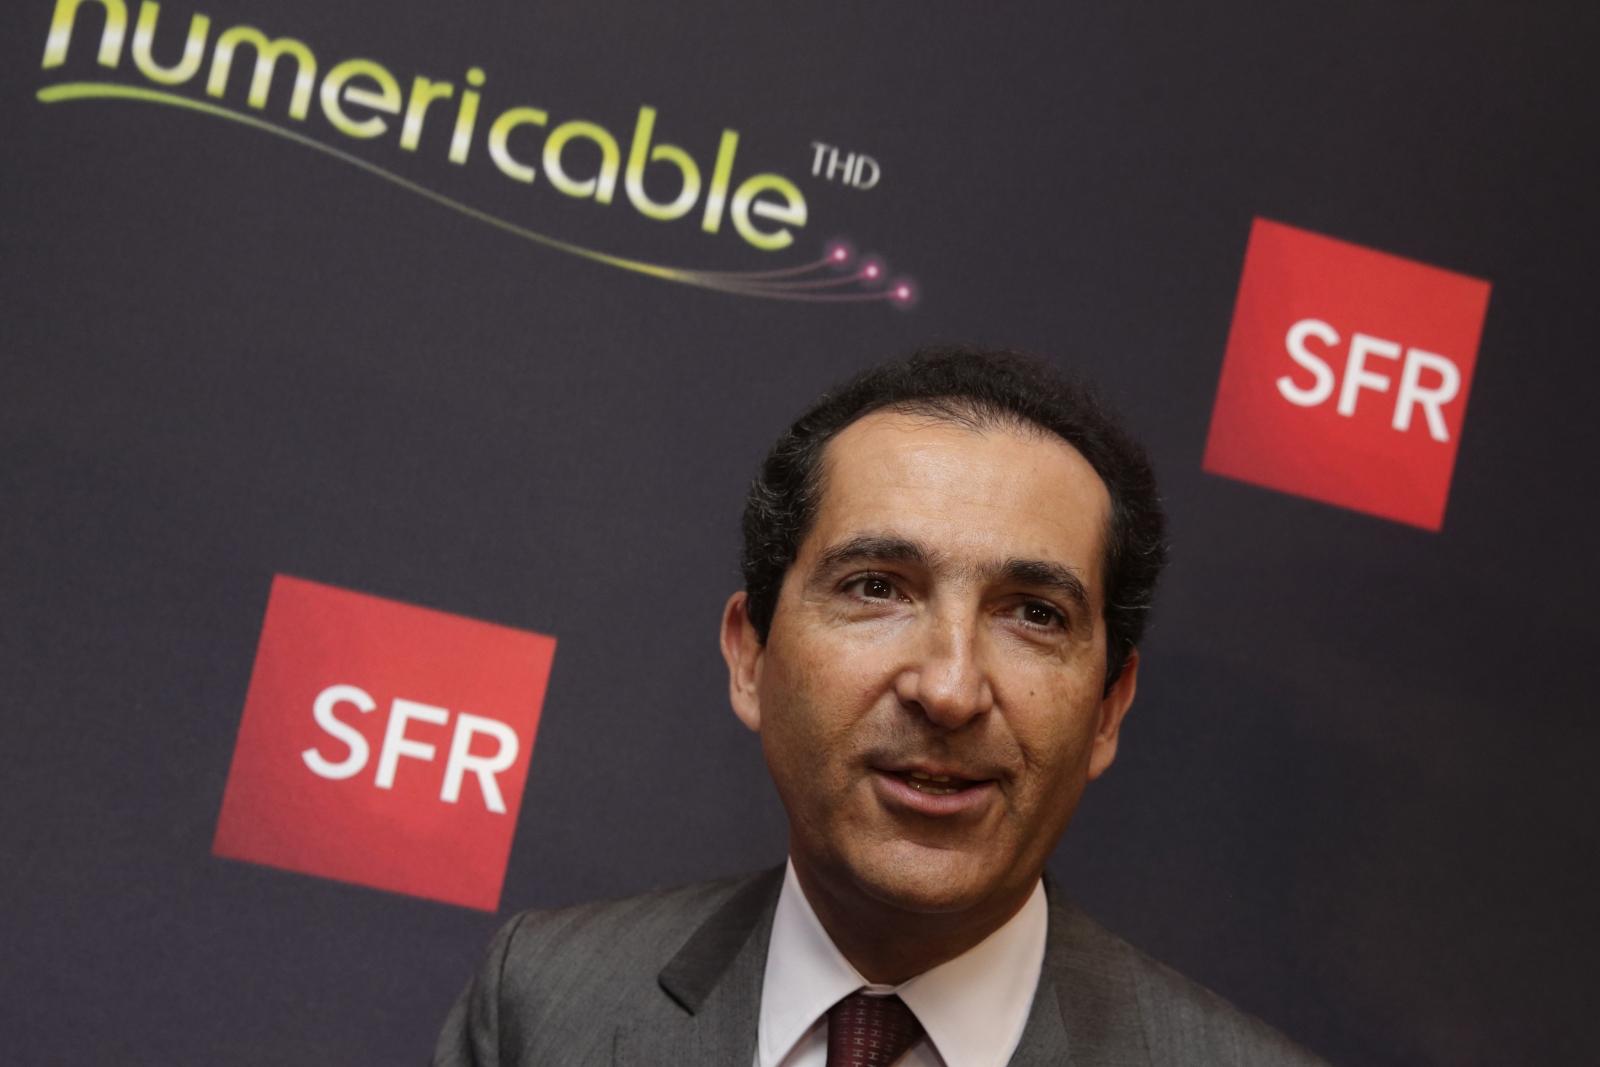 Patrick Drahi, Franco-Israeli businessman